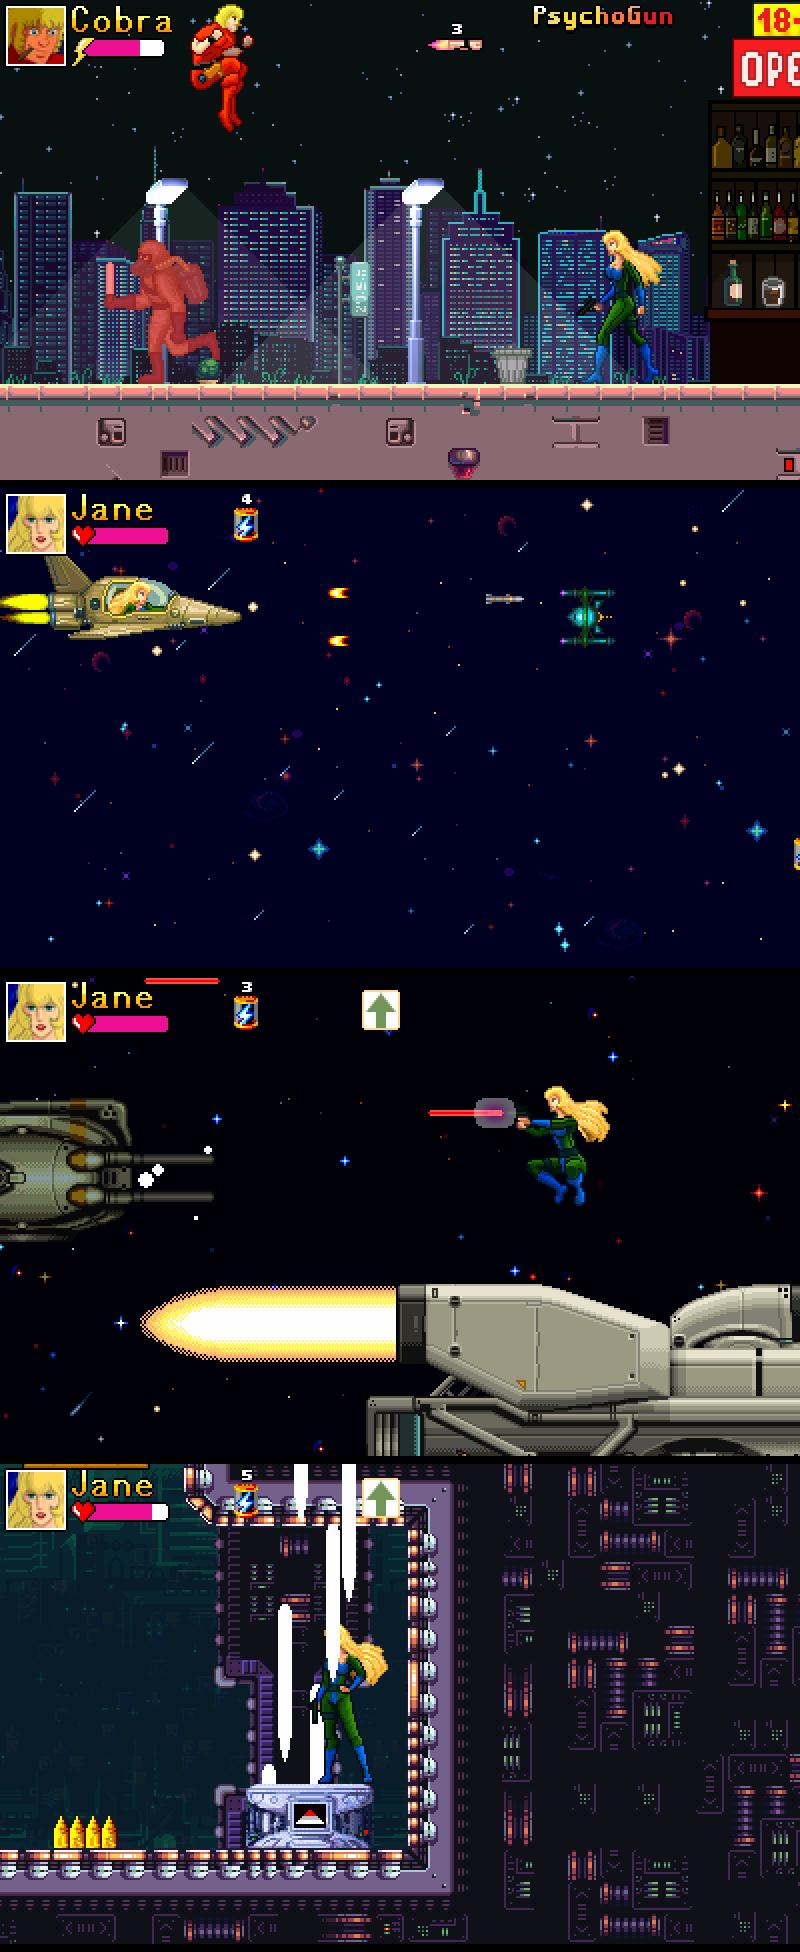 2x | Space Cobra RetPixMod